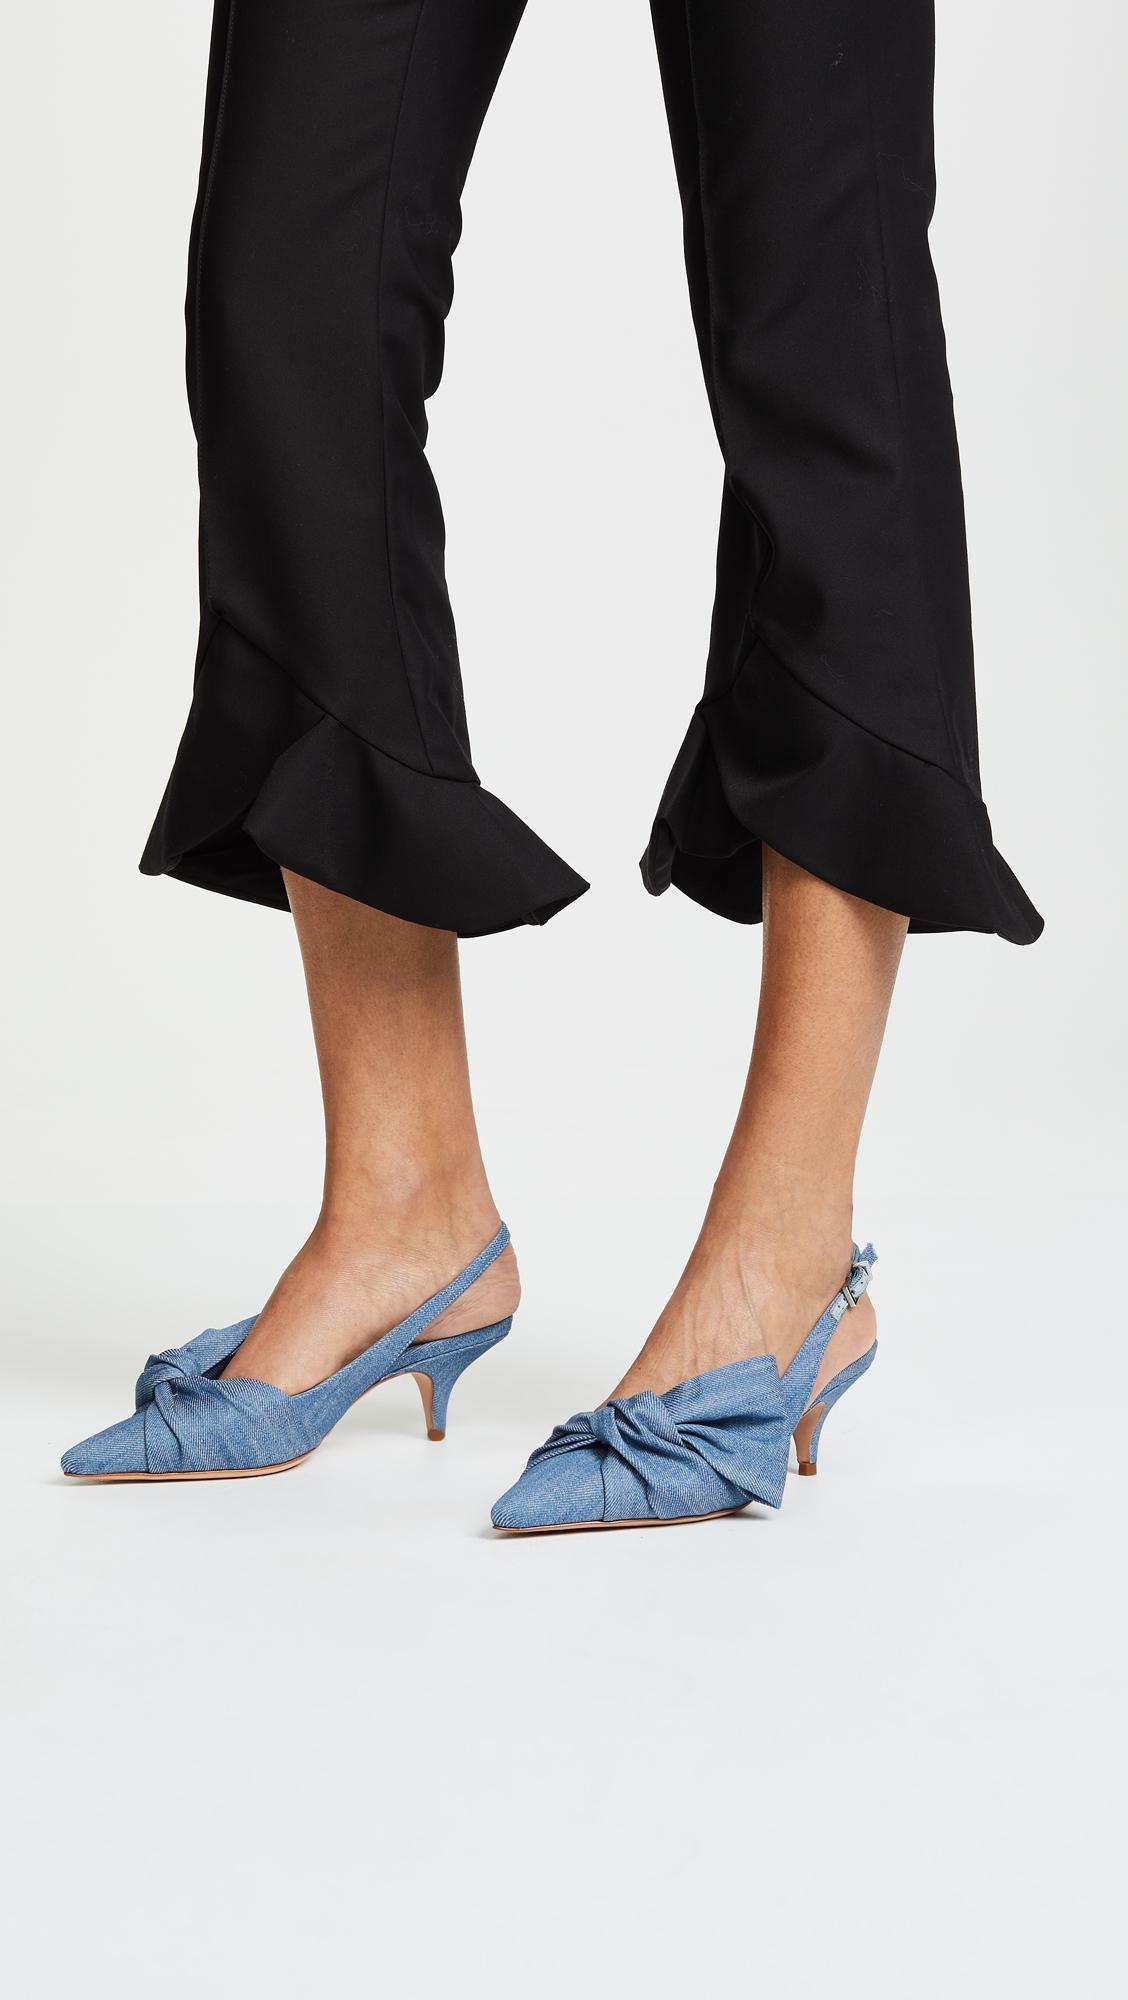 Light Blue Kitten Heels